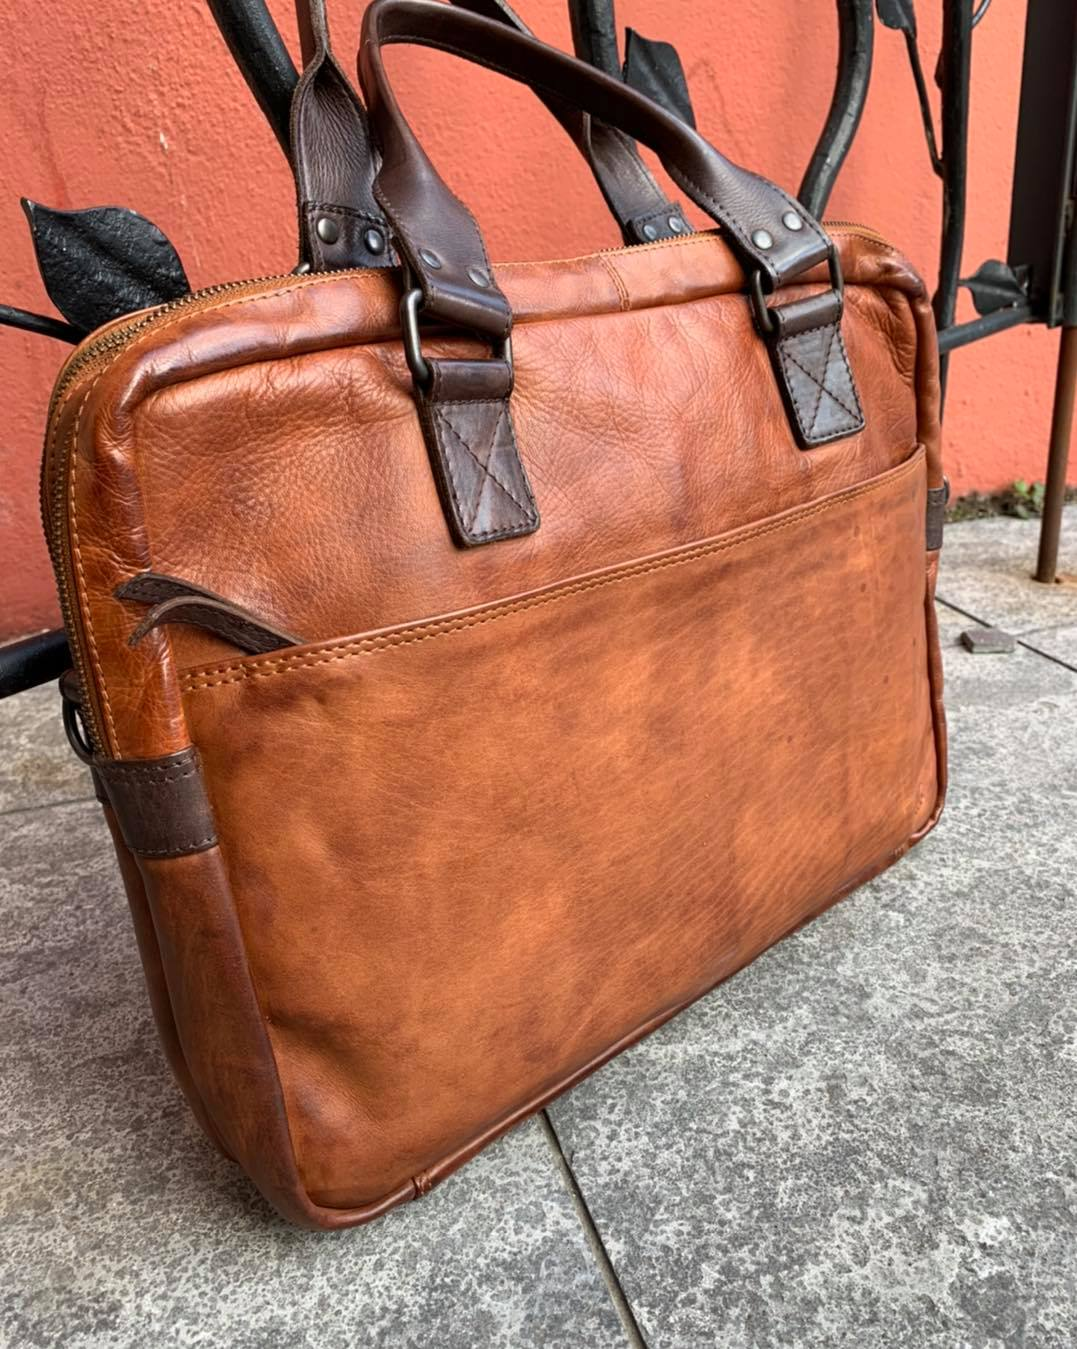 BEARDESIGN CL 32843 lederen laptoptas cognac/bruin